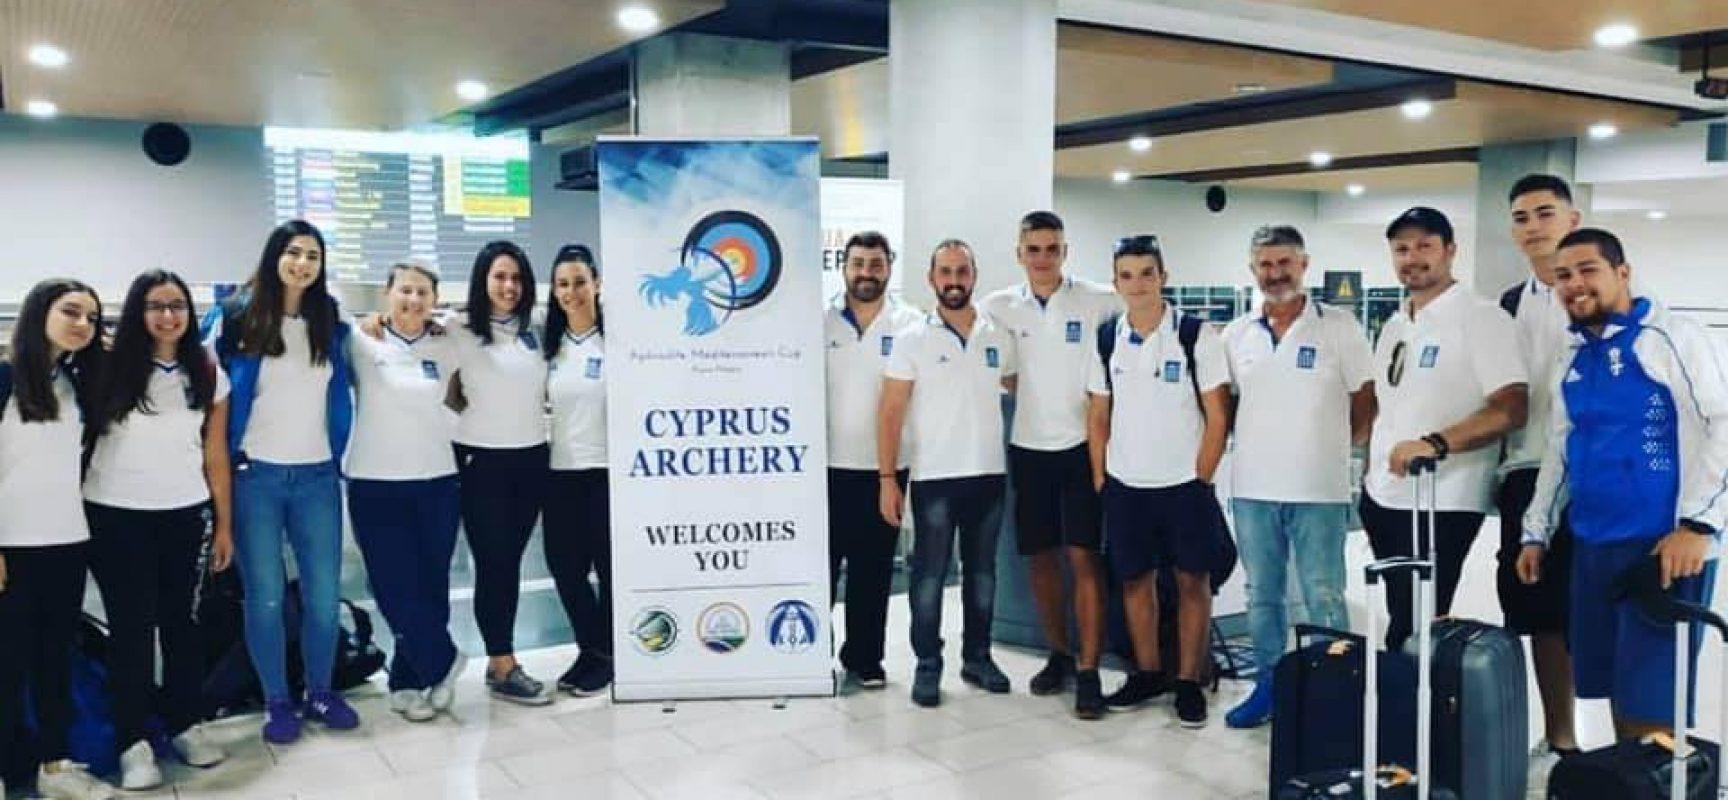 H Εθνική ομάδα στην Κύπρο για το «Aphrodite Mediterranean Cup»